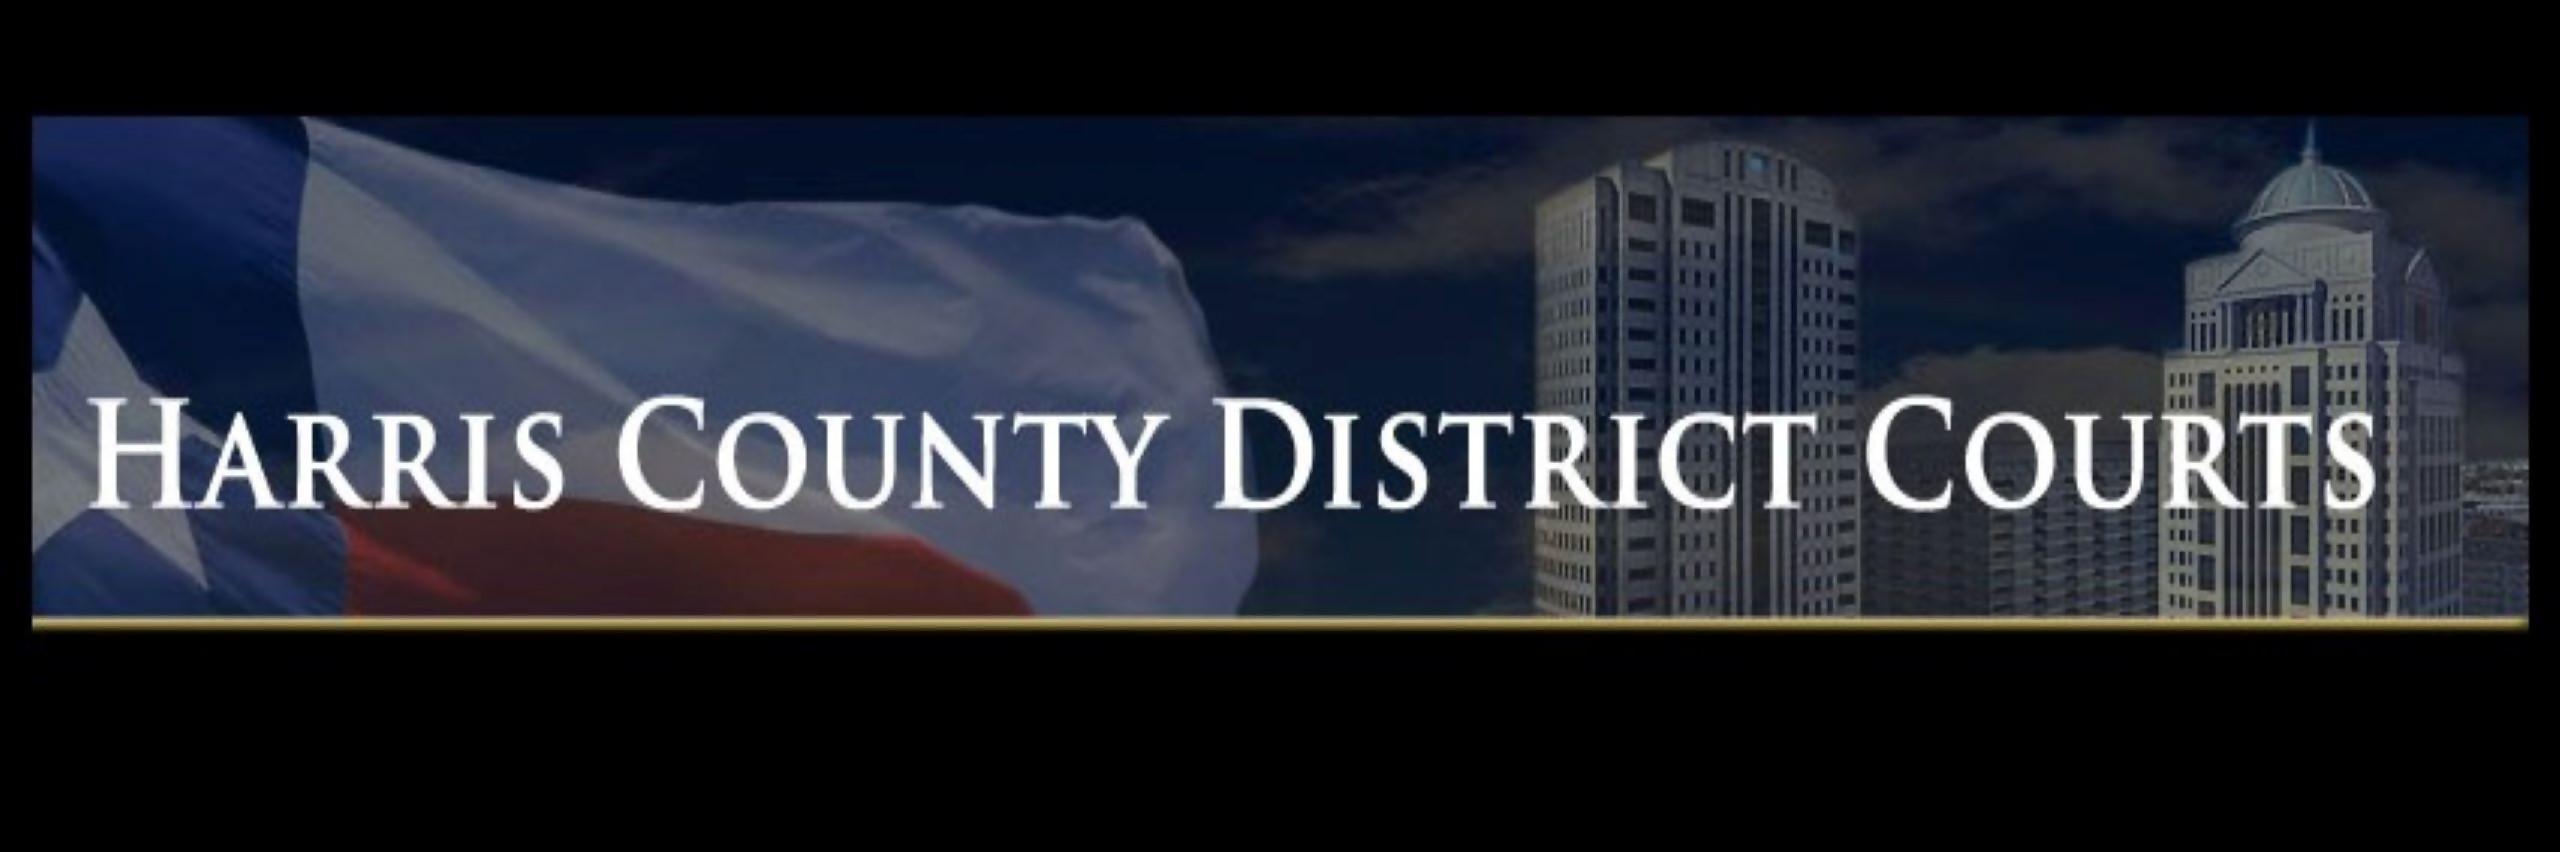 263rd District Court - Live Stream